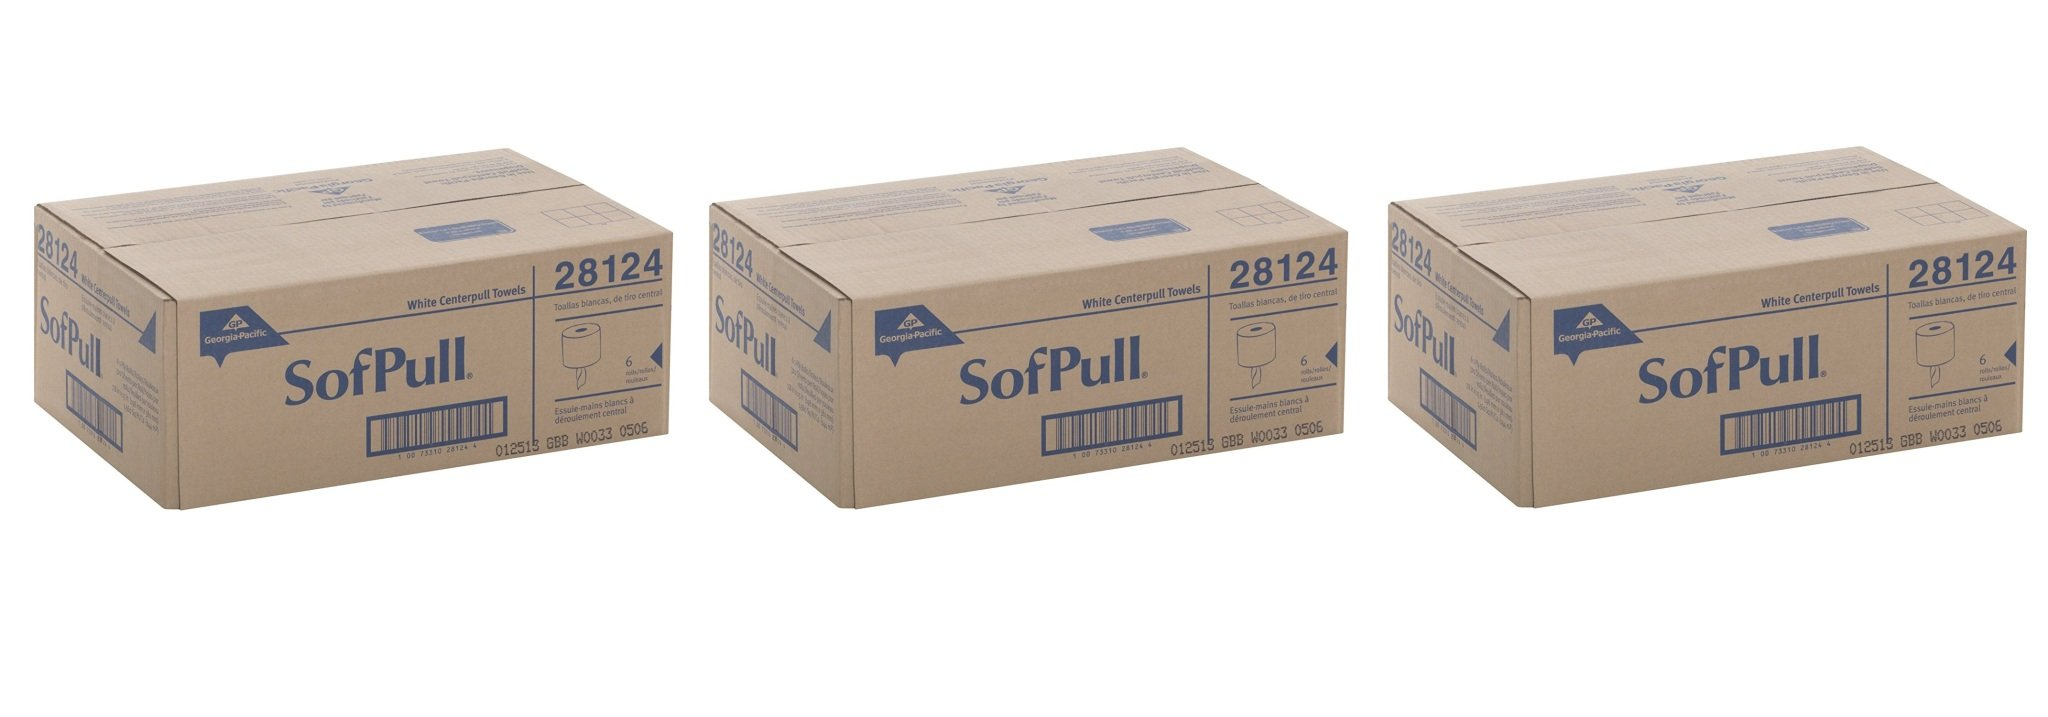 Georgia-Pacific SofPull 28124 White vdVapc Premium 1-Ply Regular Capacity Centerpull Paper Towel, 3Pack (6 Rolls)